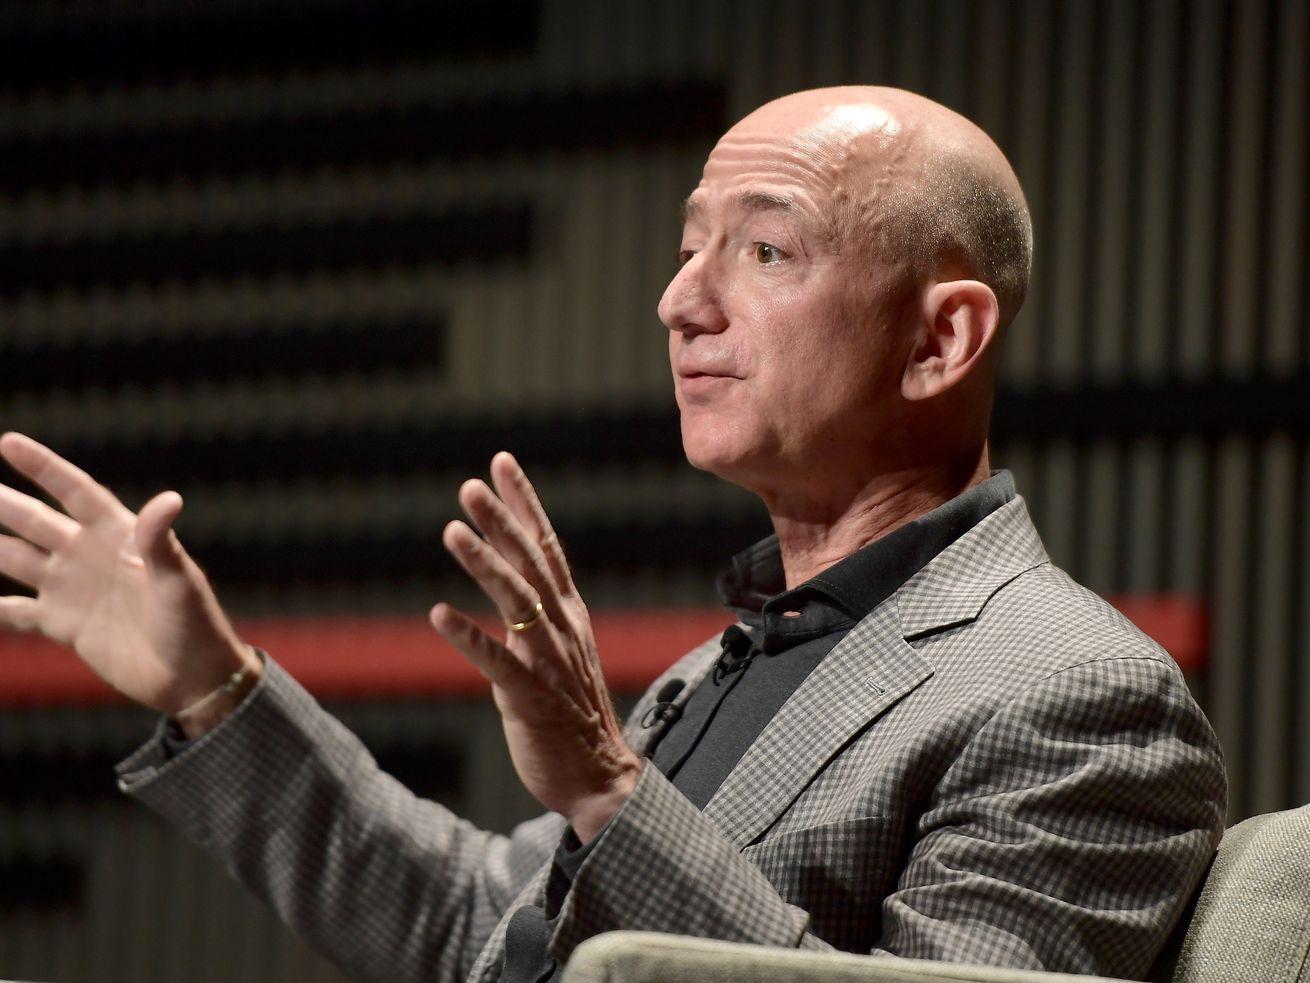 Jeff Bezos's Amazon may pay US publishers to expand their international presence.